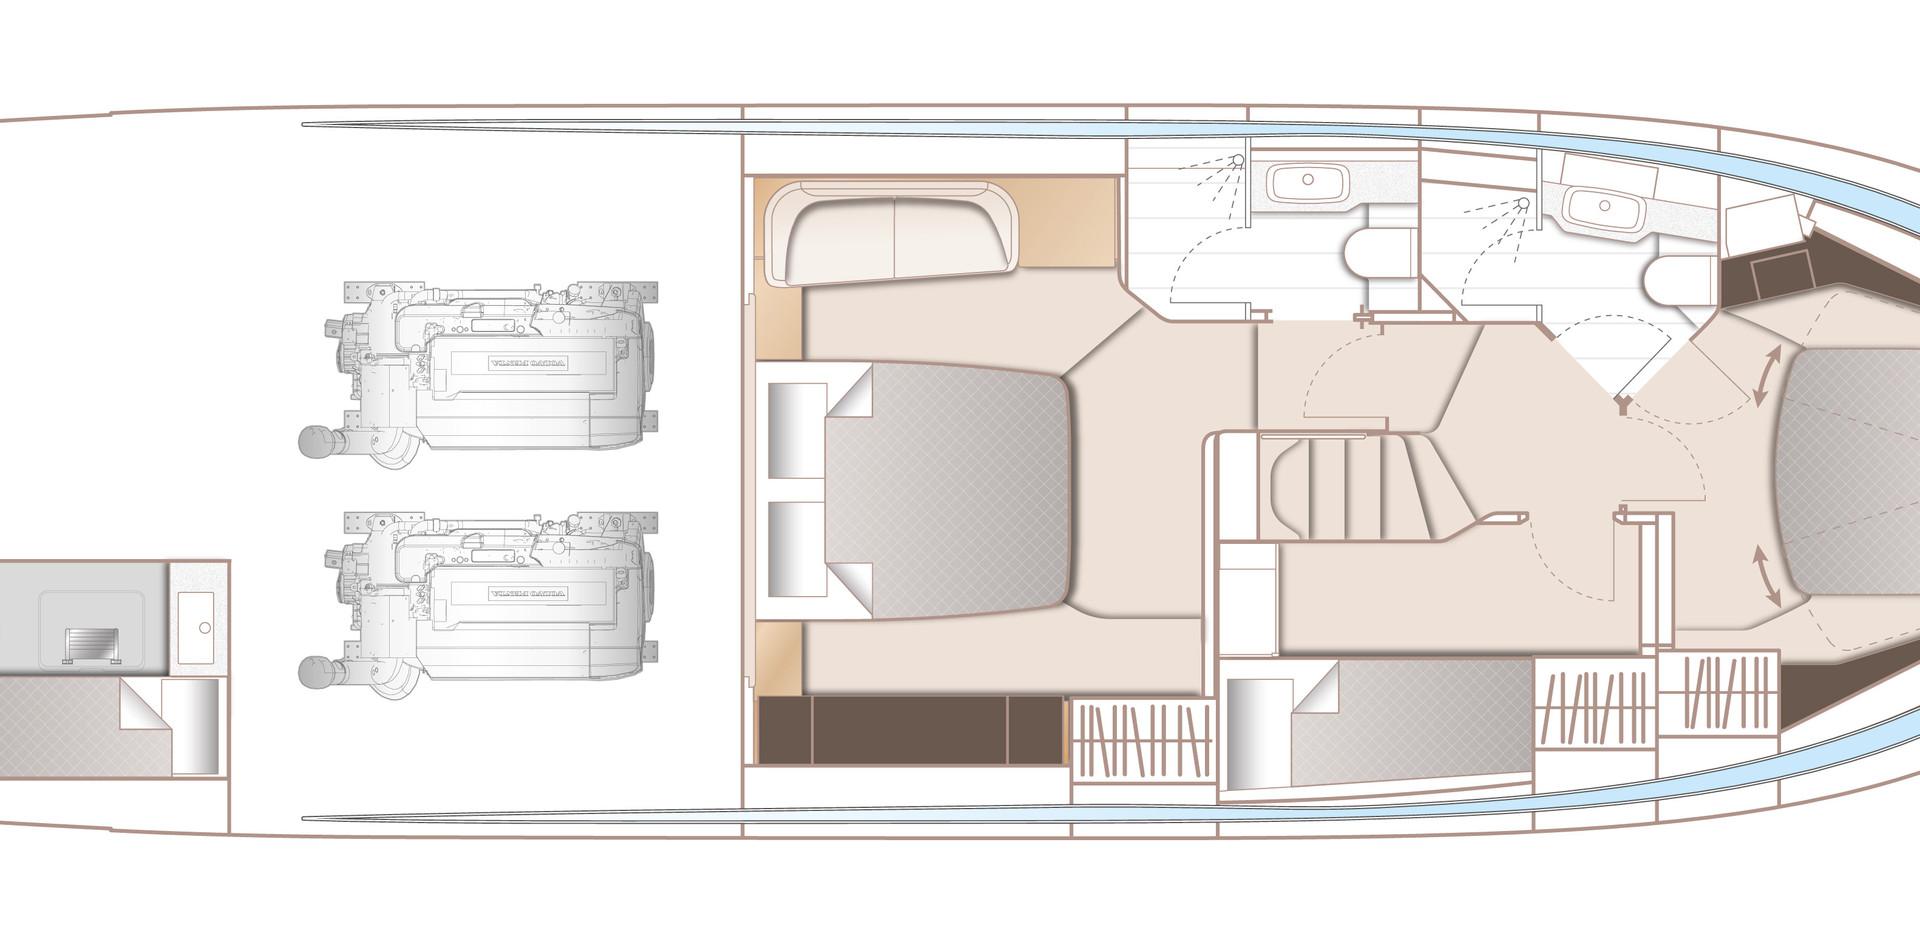 v55-layout-lower-deck.jpg